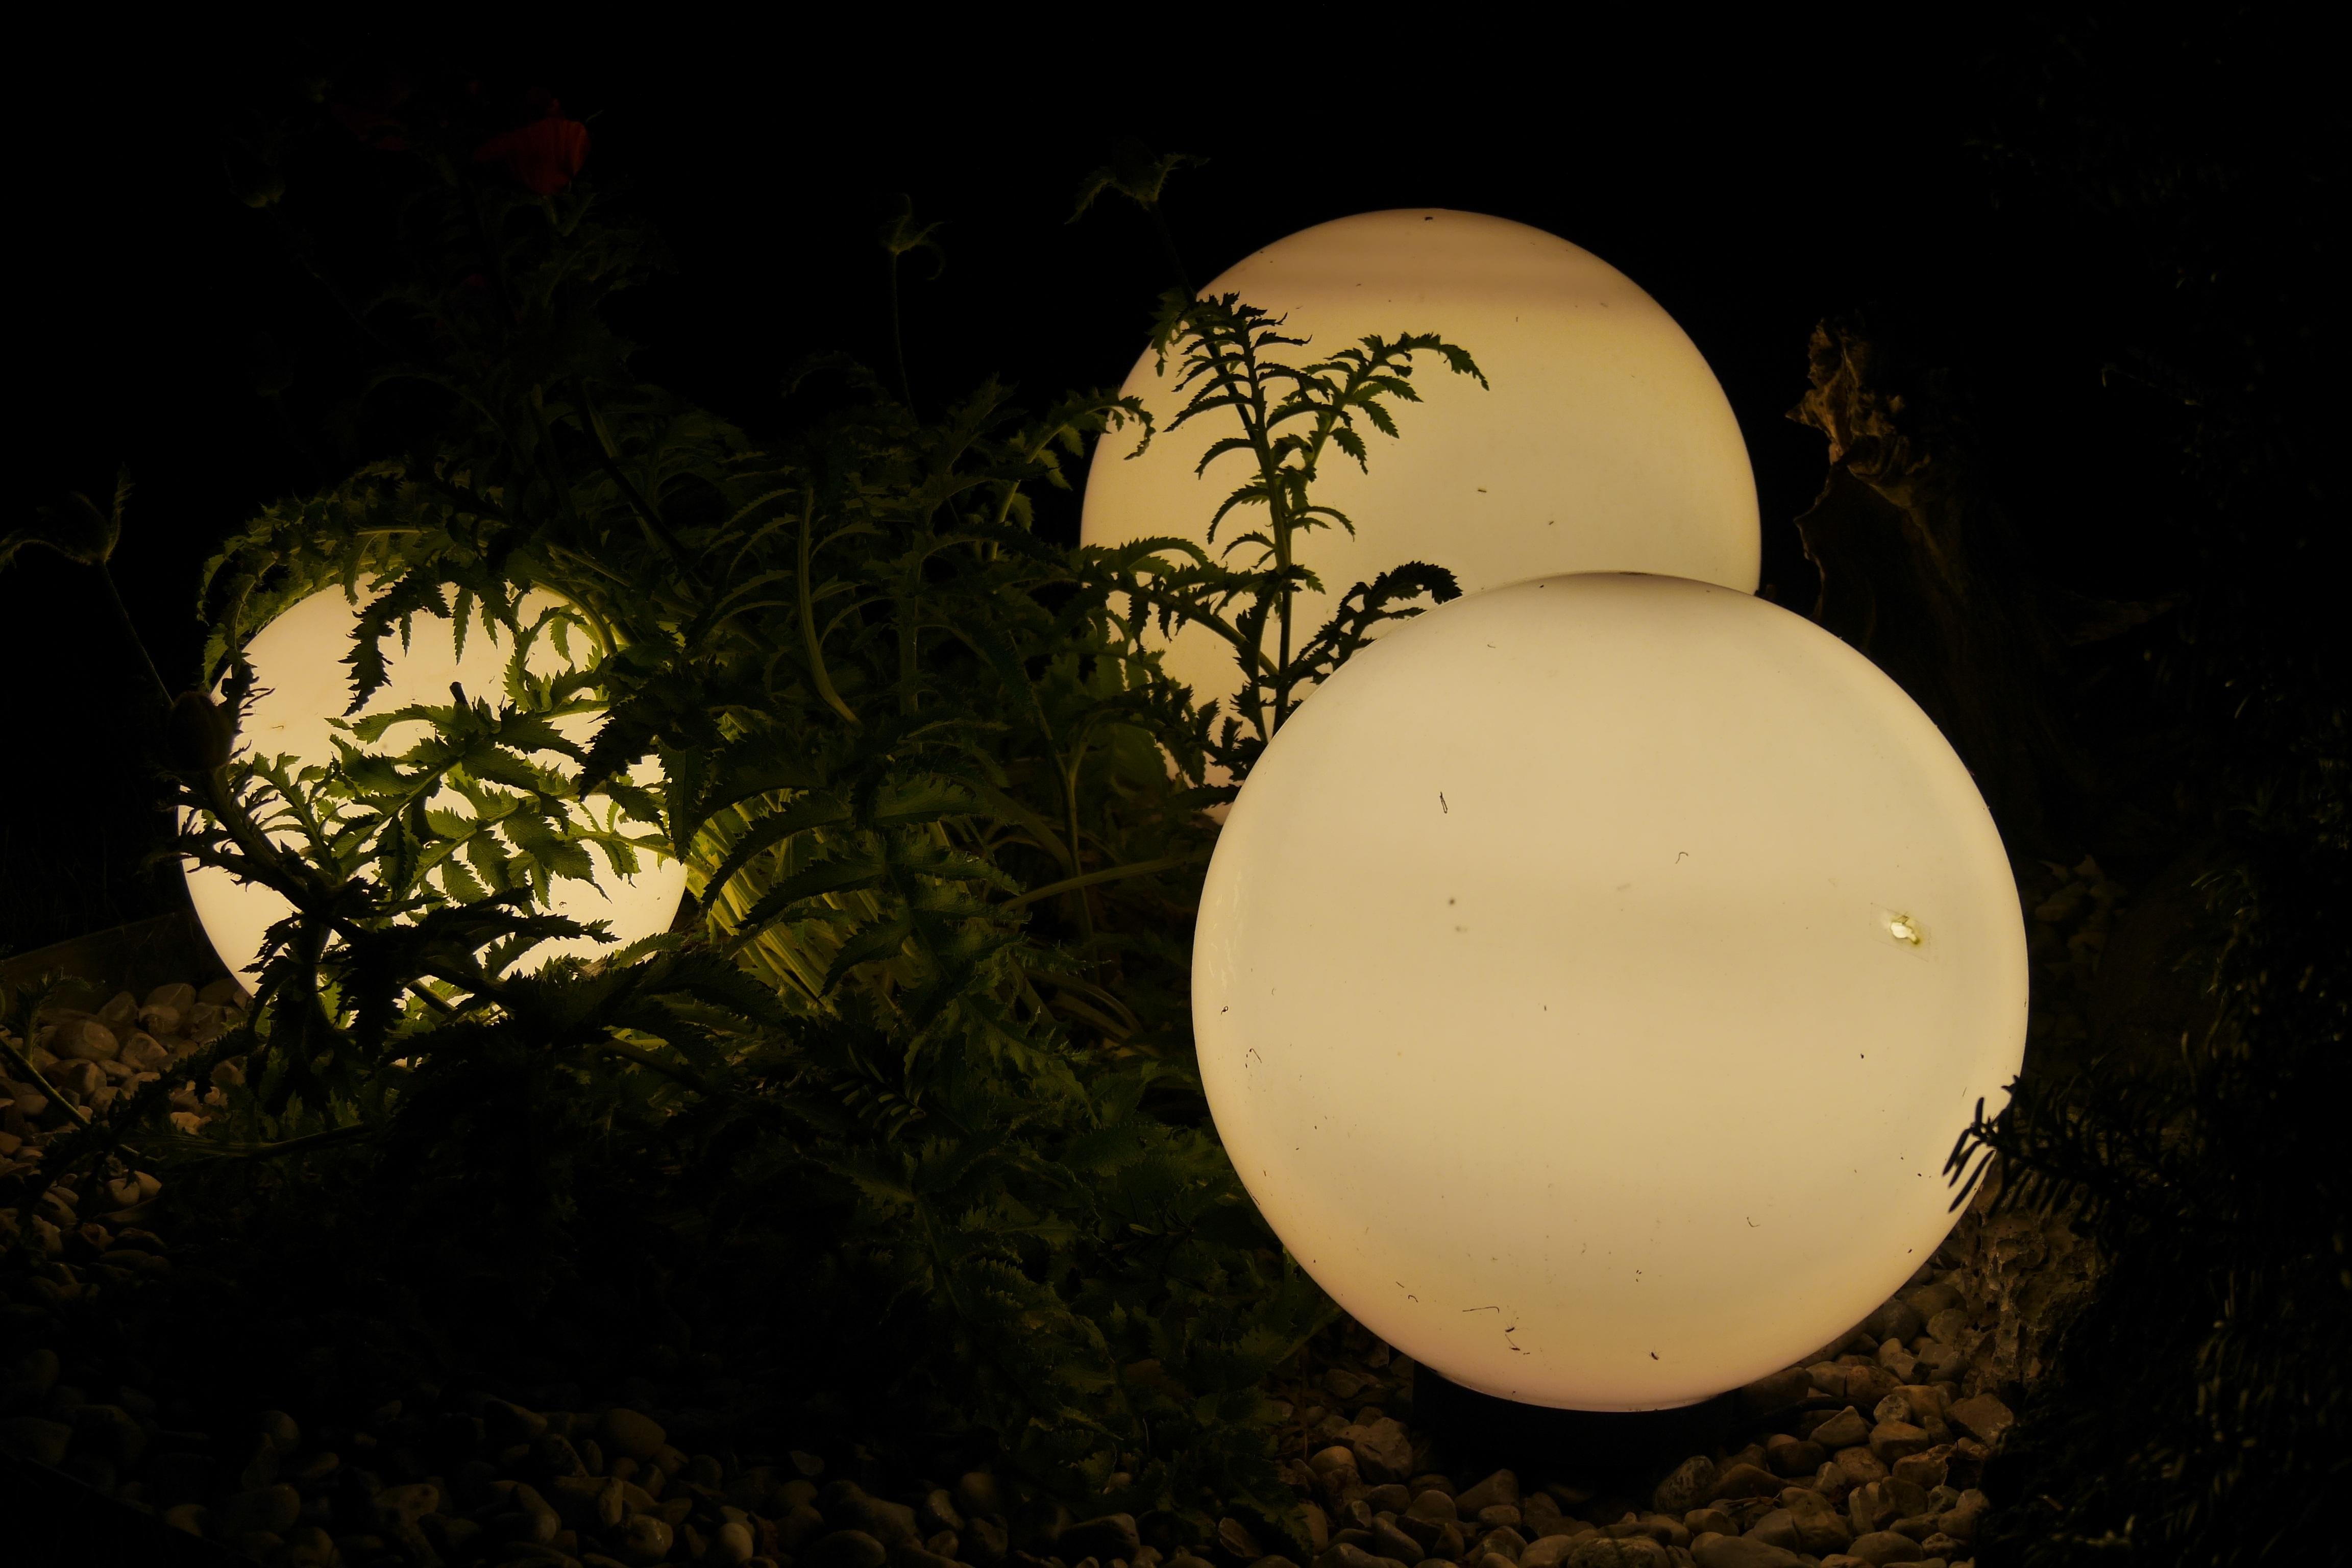 outdoor lighting balls. Light Sun Night Leaf Reflection Color Darkness Yellow Garden Lighting Circle Lights Lamps Balls Shape Macro Outdoor E